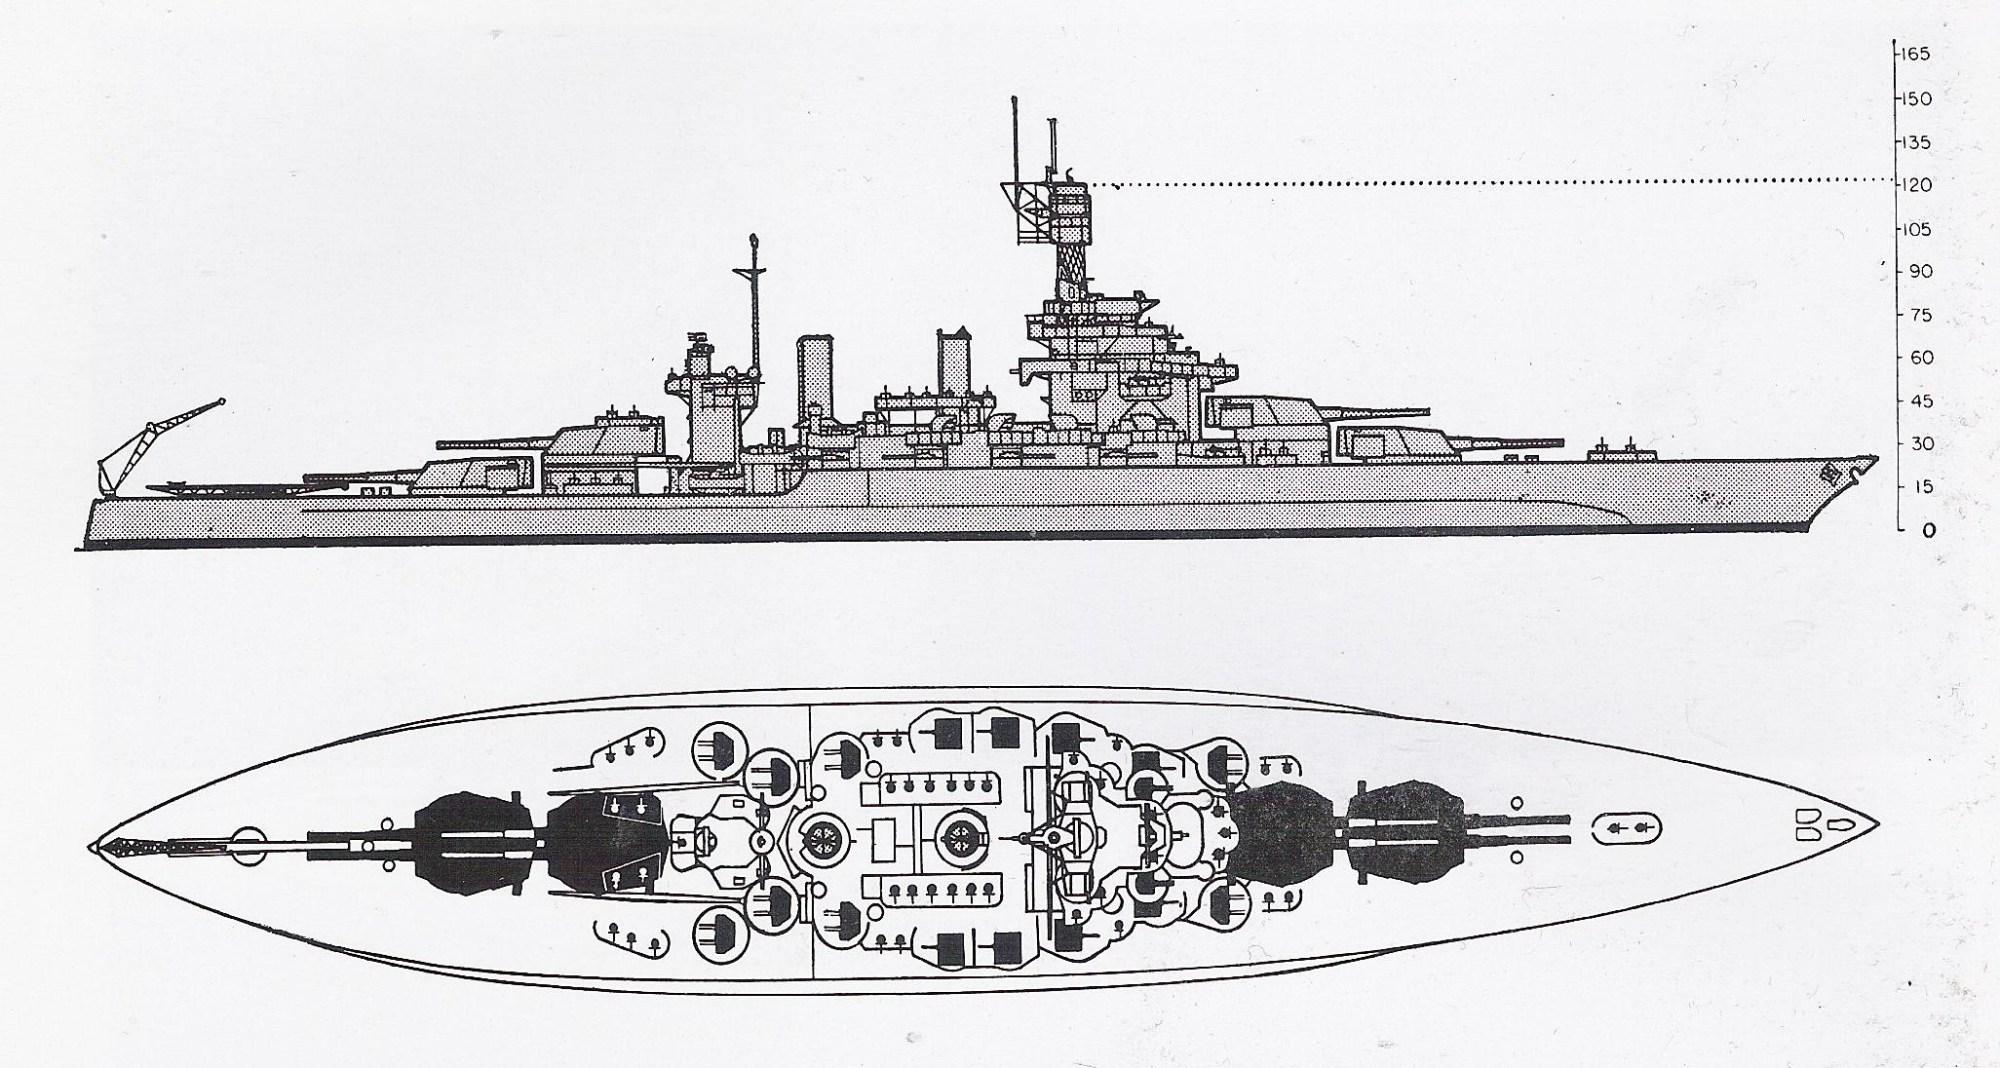 hight resolution of schematic diagram of colorado class battleship